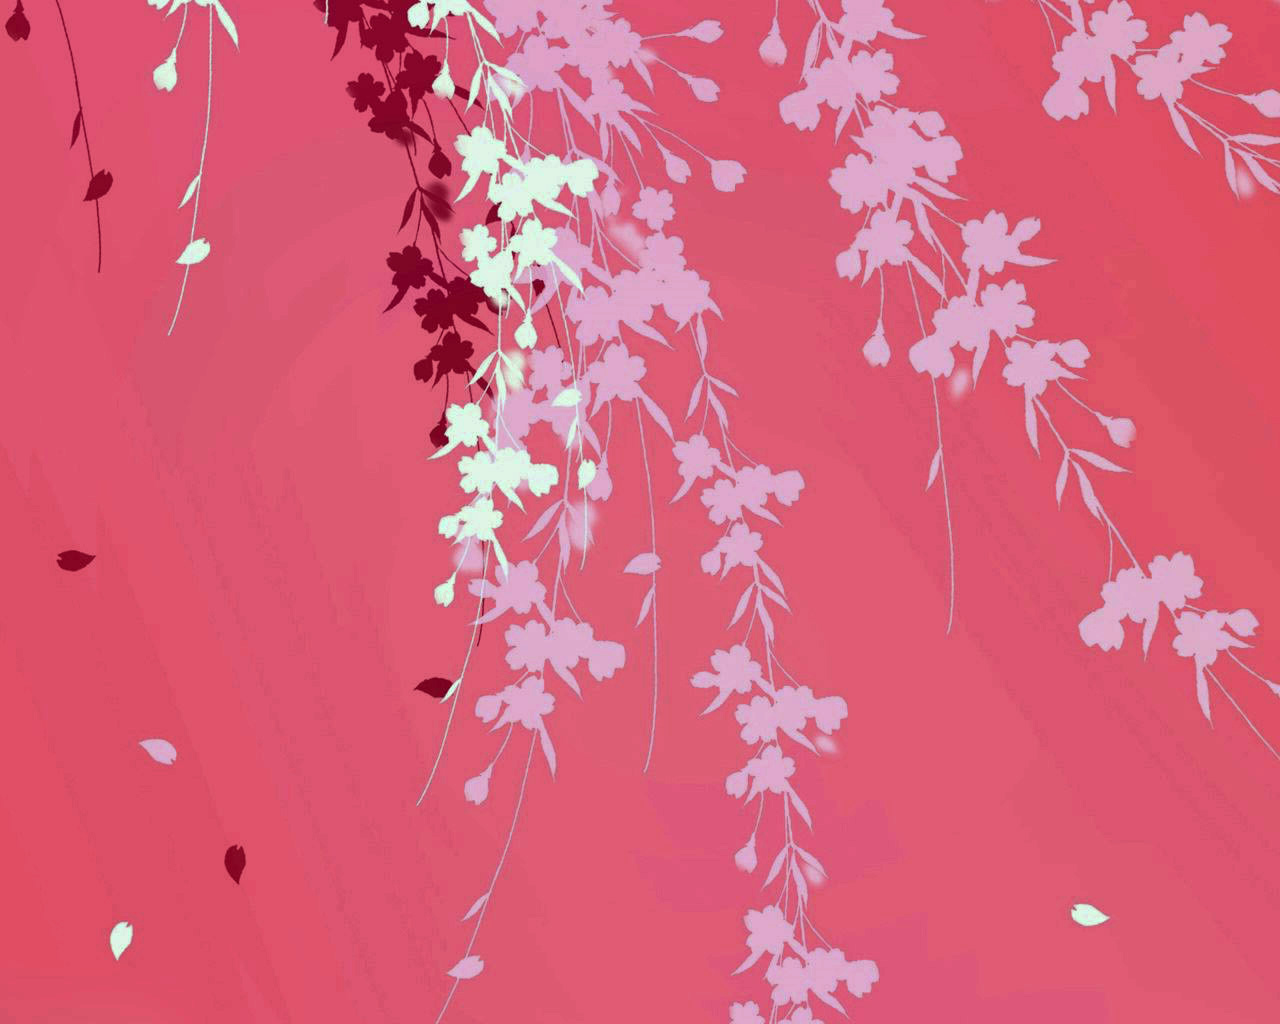 wallpaper microsoft word 2010